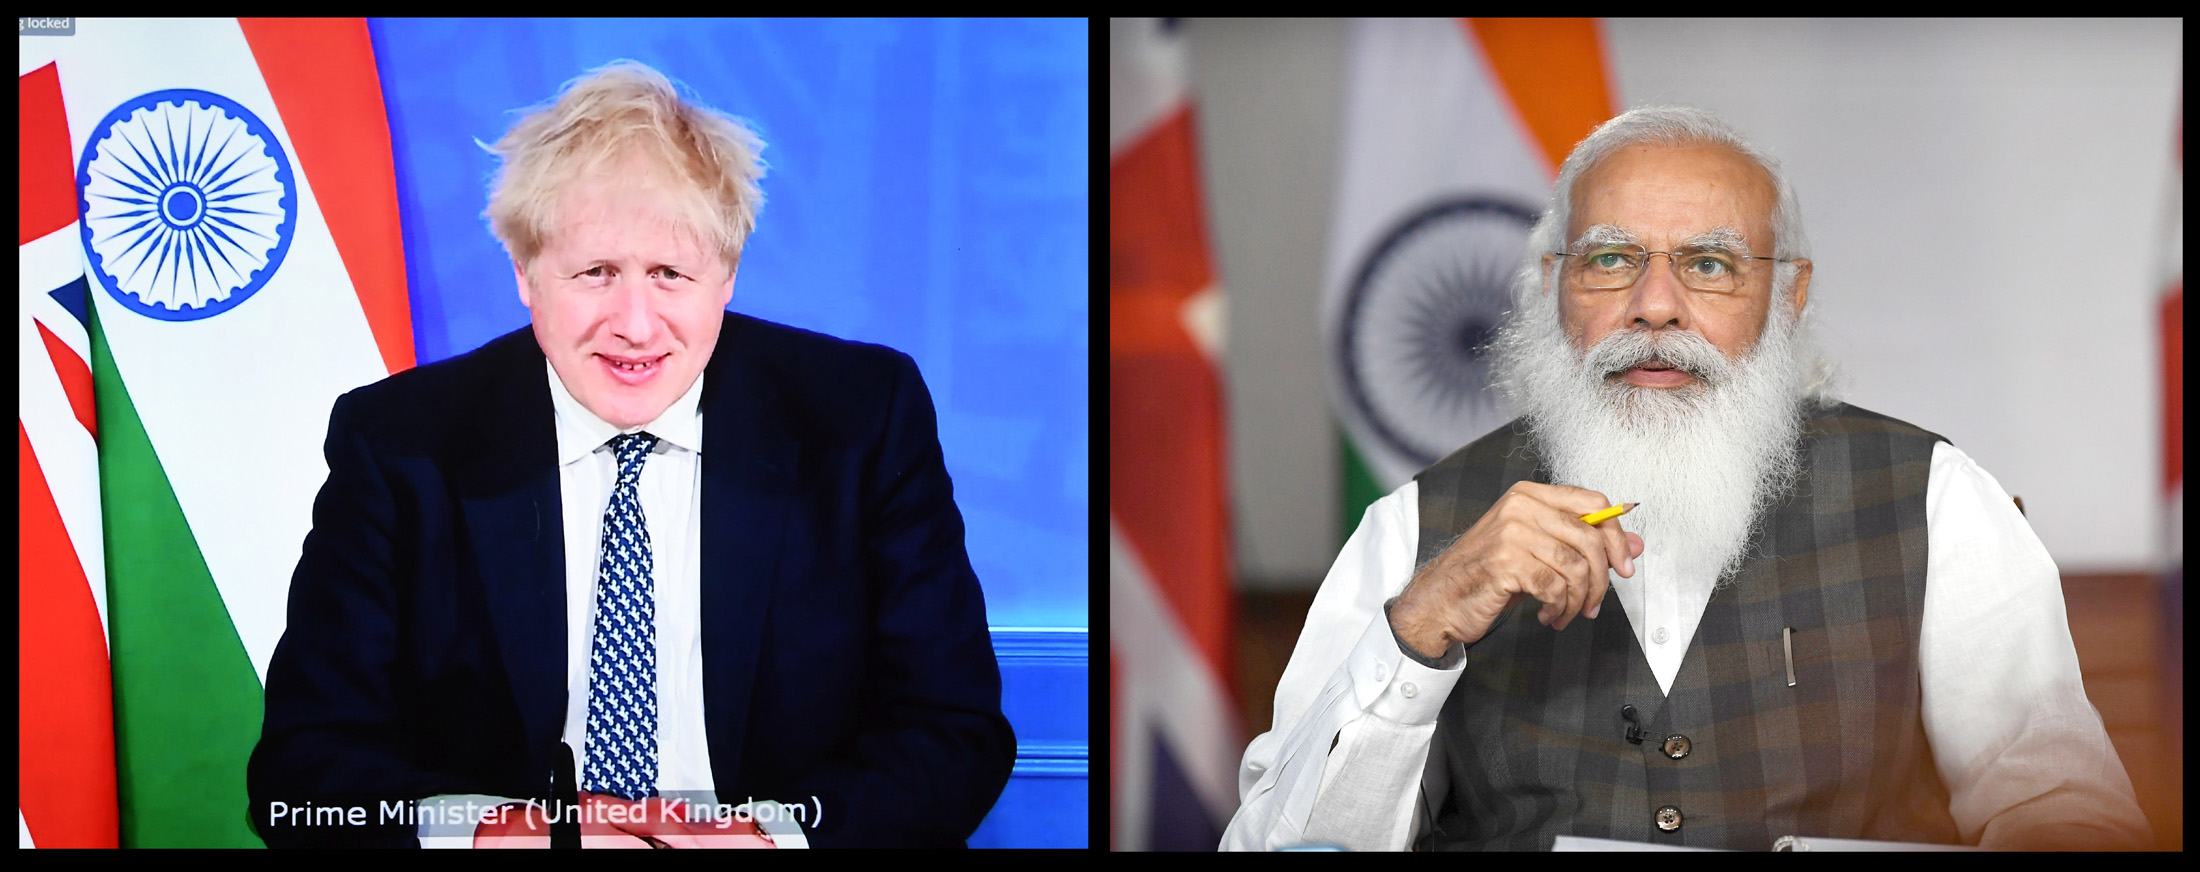 PM-Johnson-meet.jpg